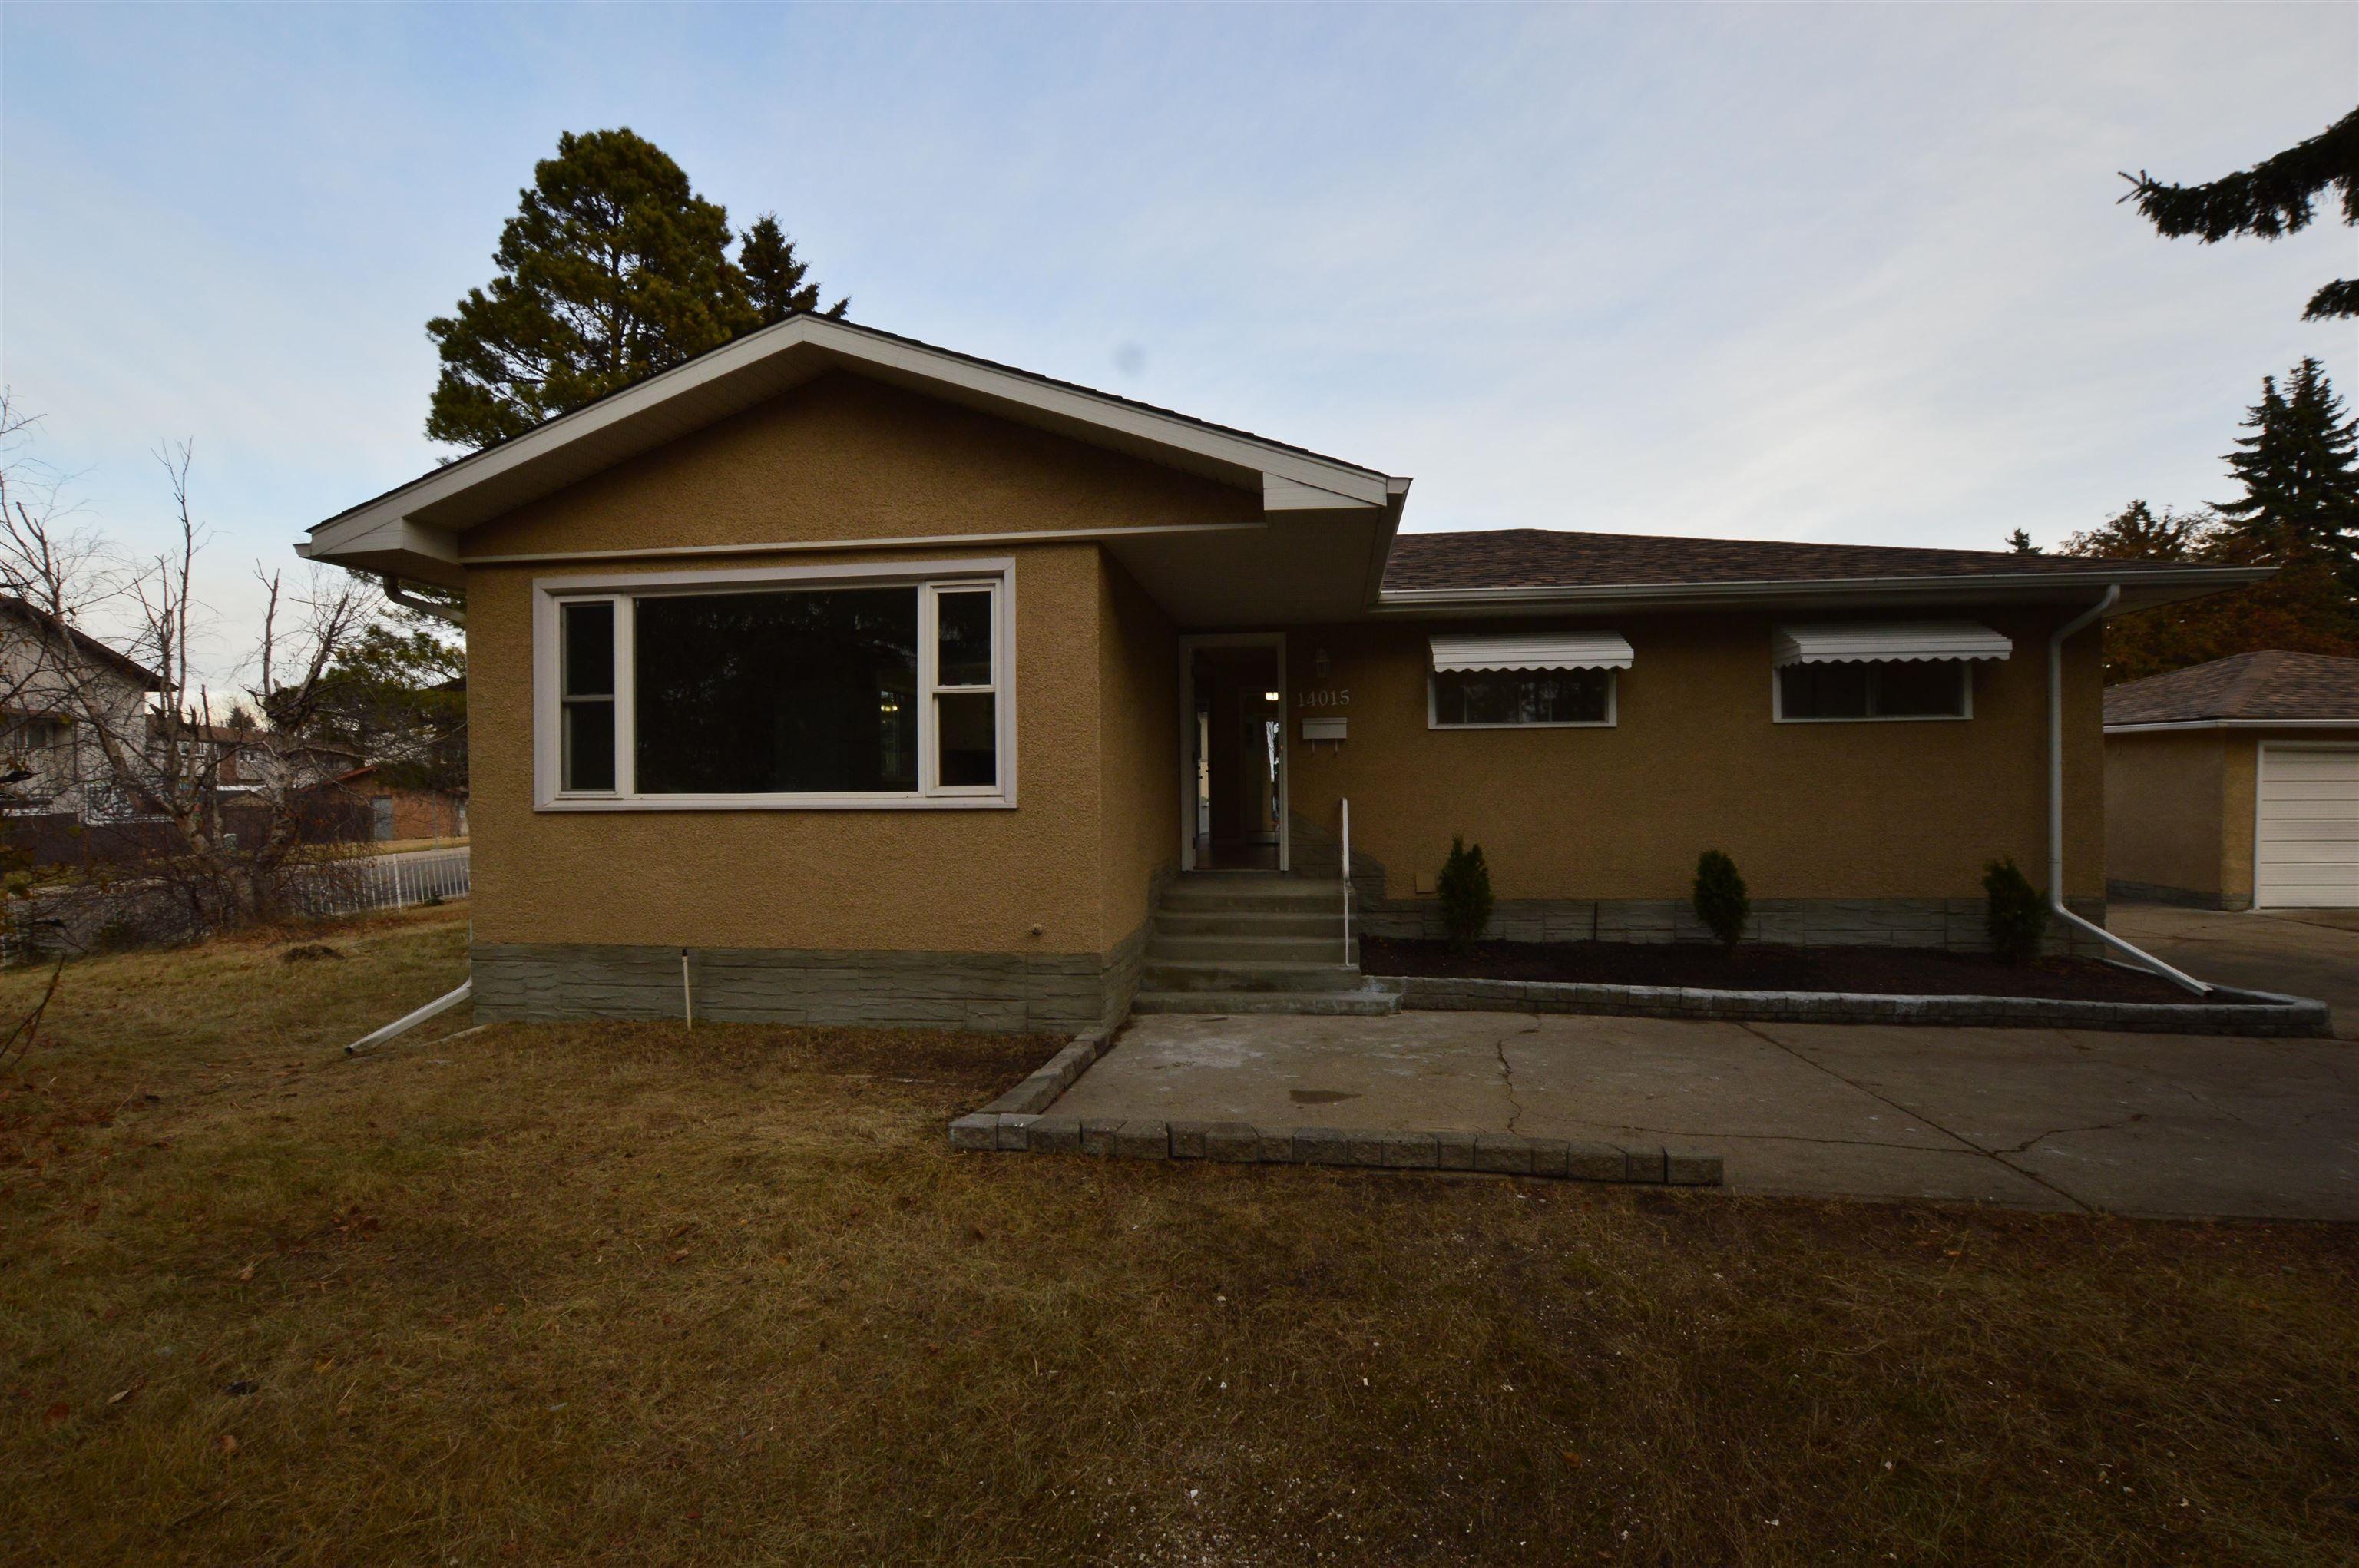 Main Photo: 14015 82 Street in Edmonton: Zone 02 House for sale : MLS®# E4262981